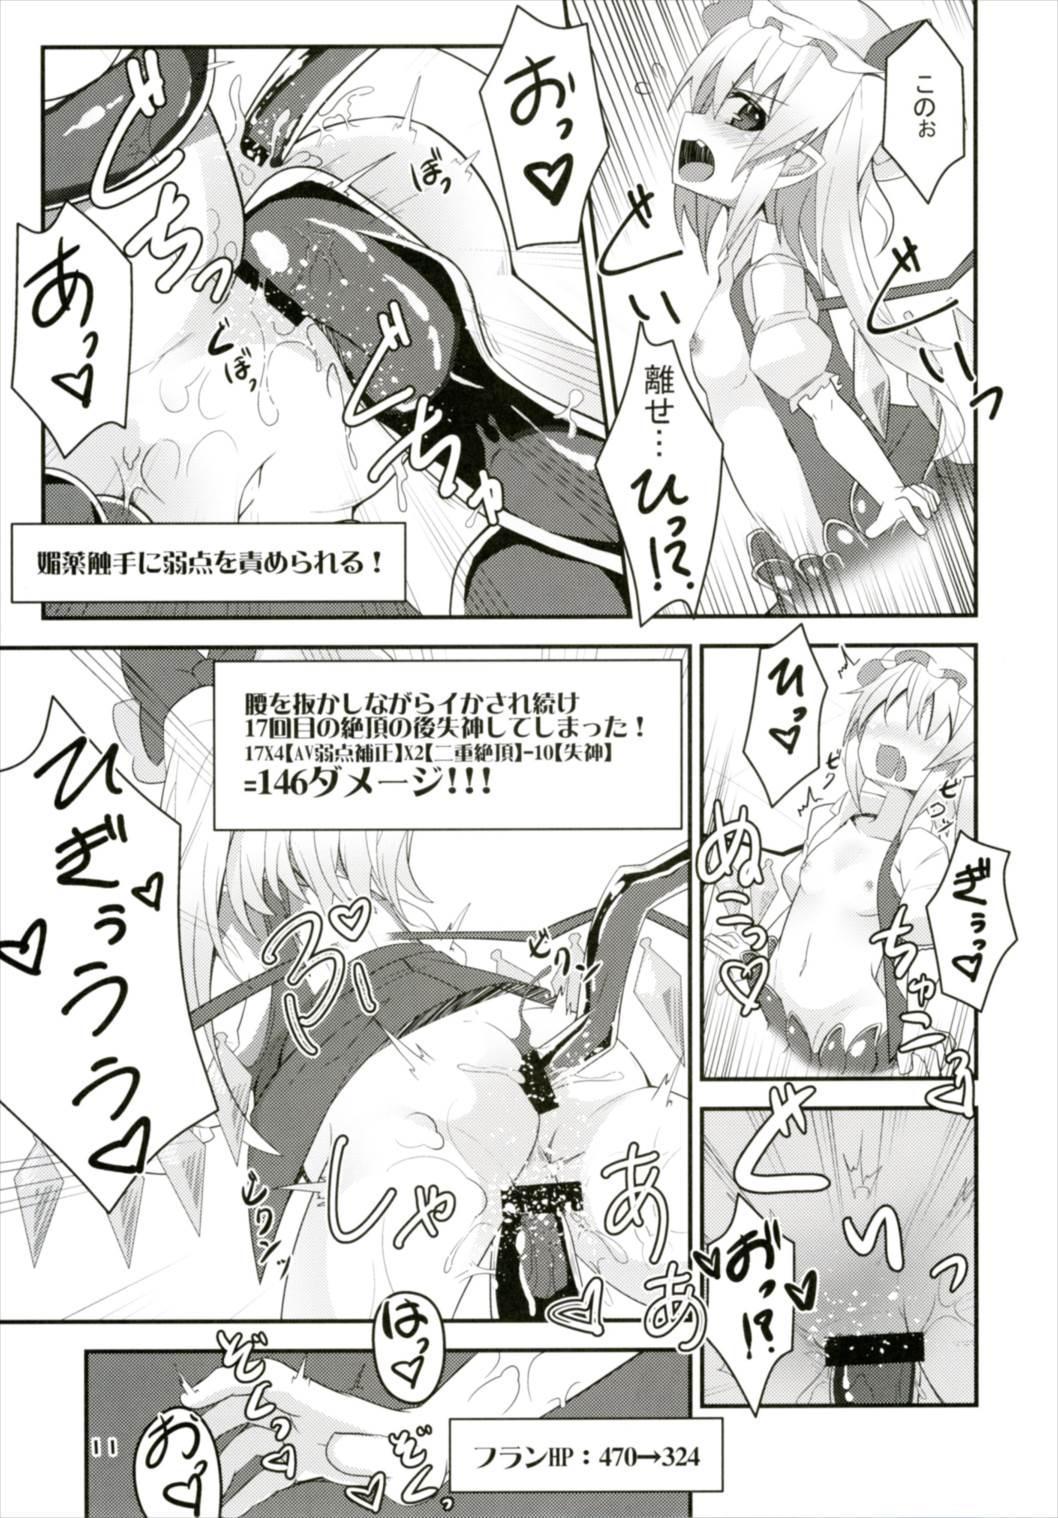 Flan-chan no Ero Trap Dungeon HARDCORE TAIL 9